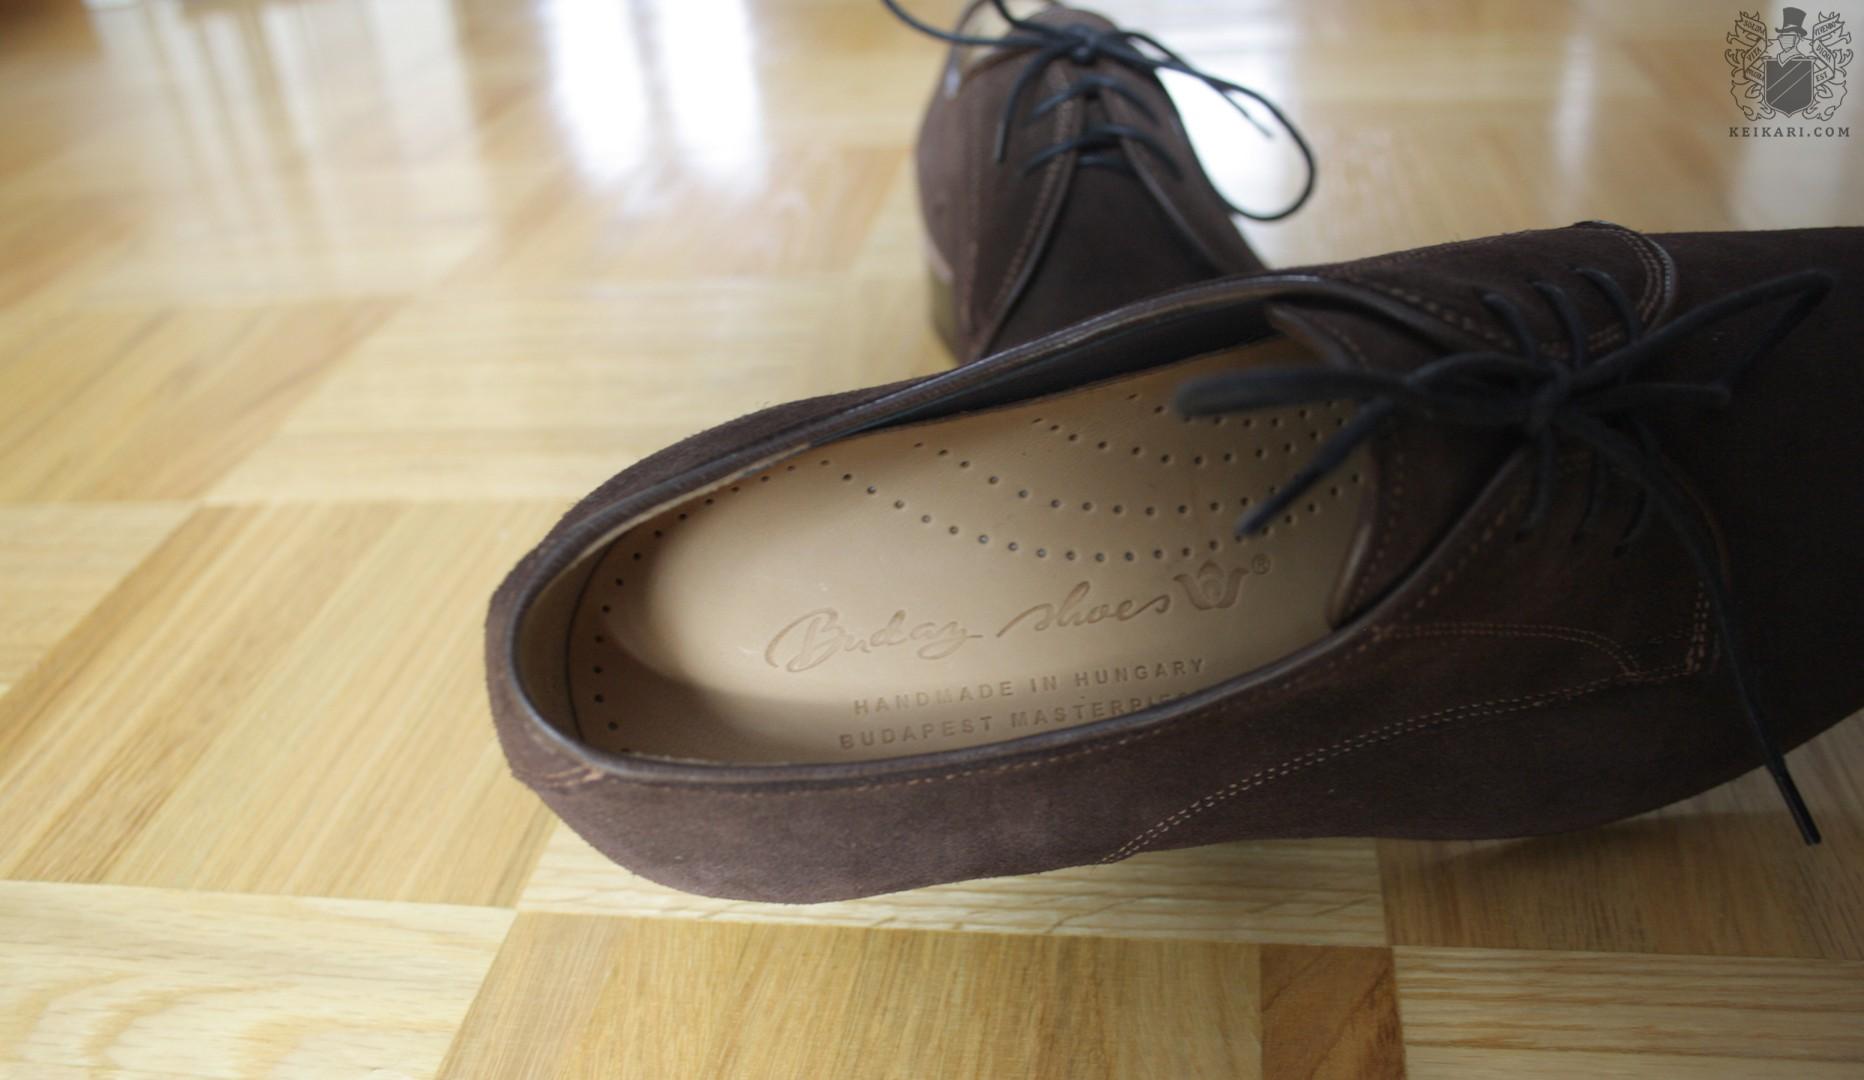 Anatomy_of_Buday_shoes_at_Keikari_dot_com15.jpg